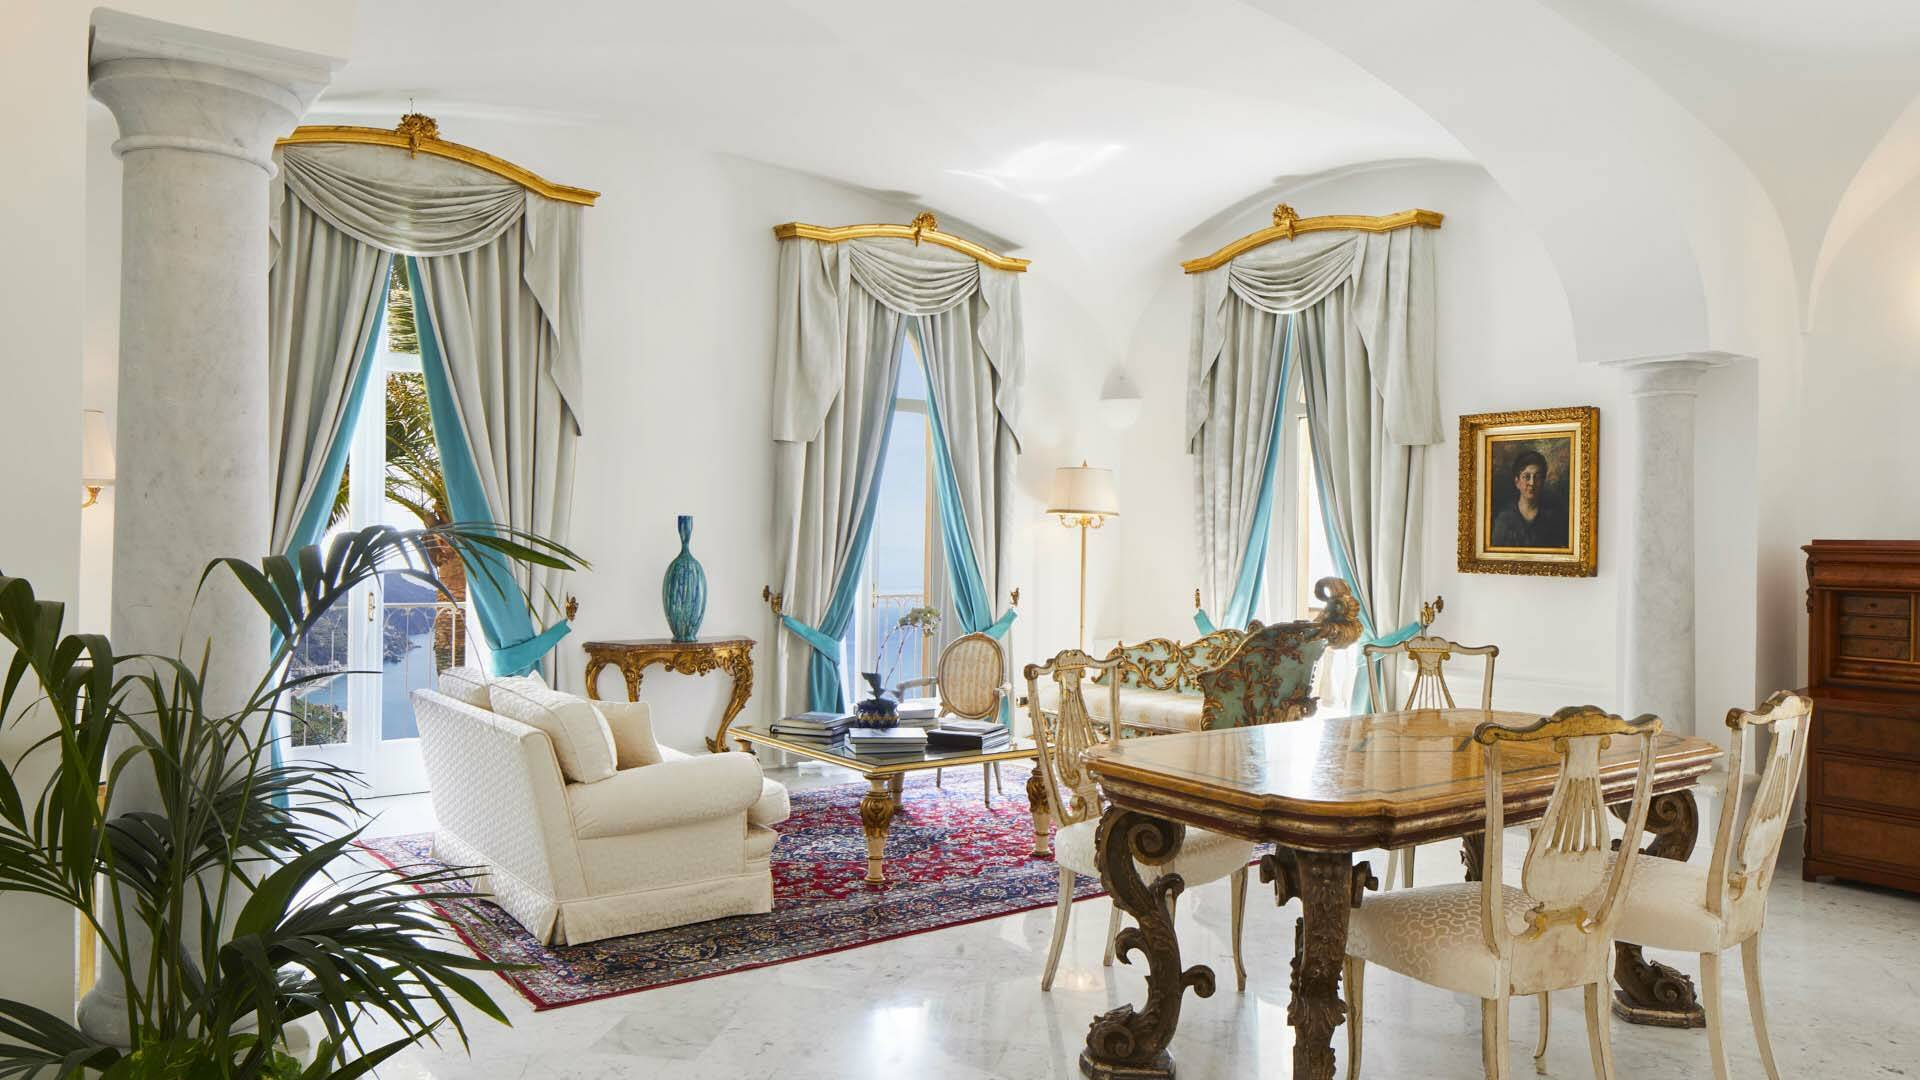 Palazzo Avino Ravello Italie Orizzonte suite